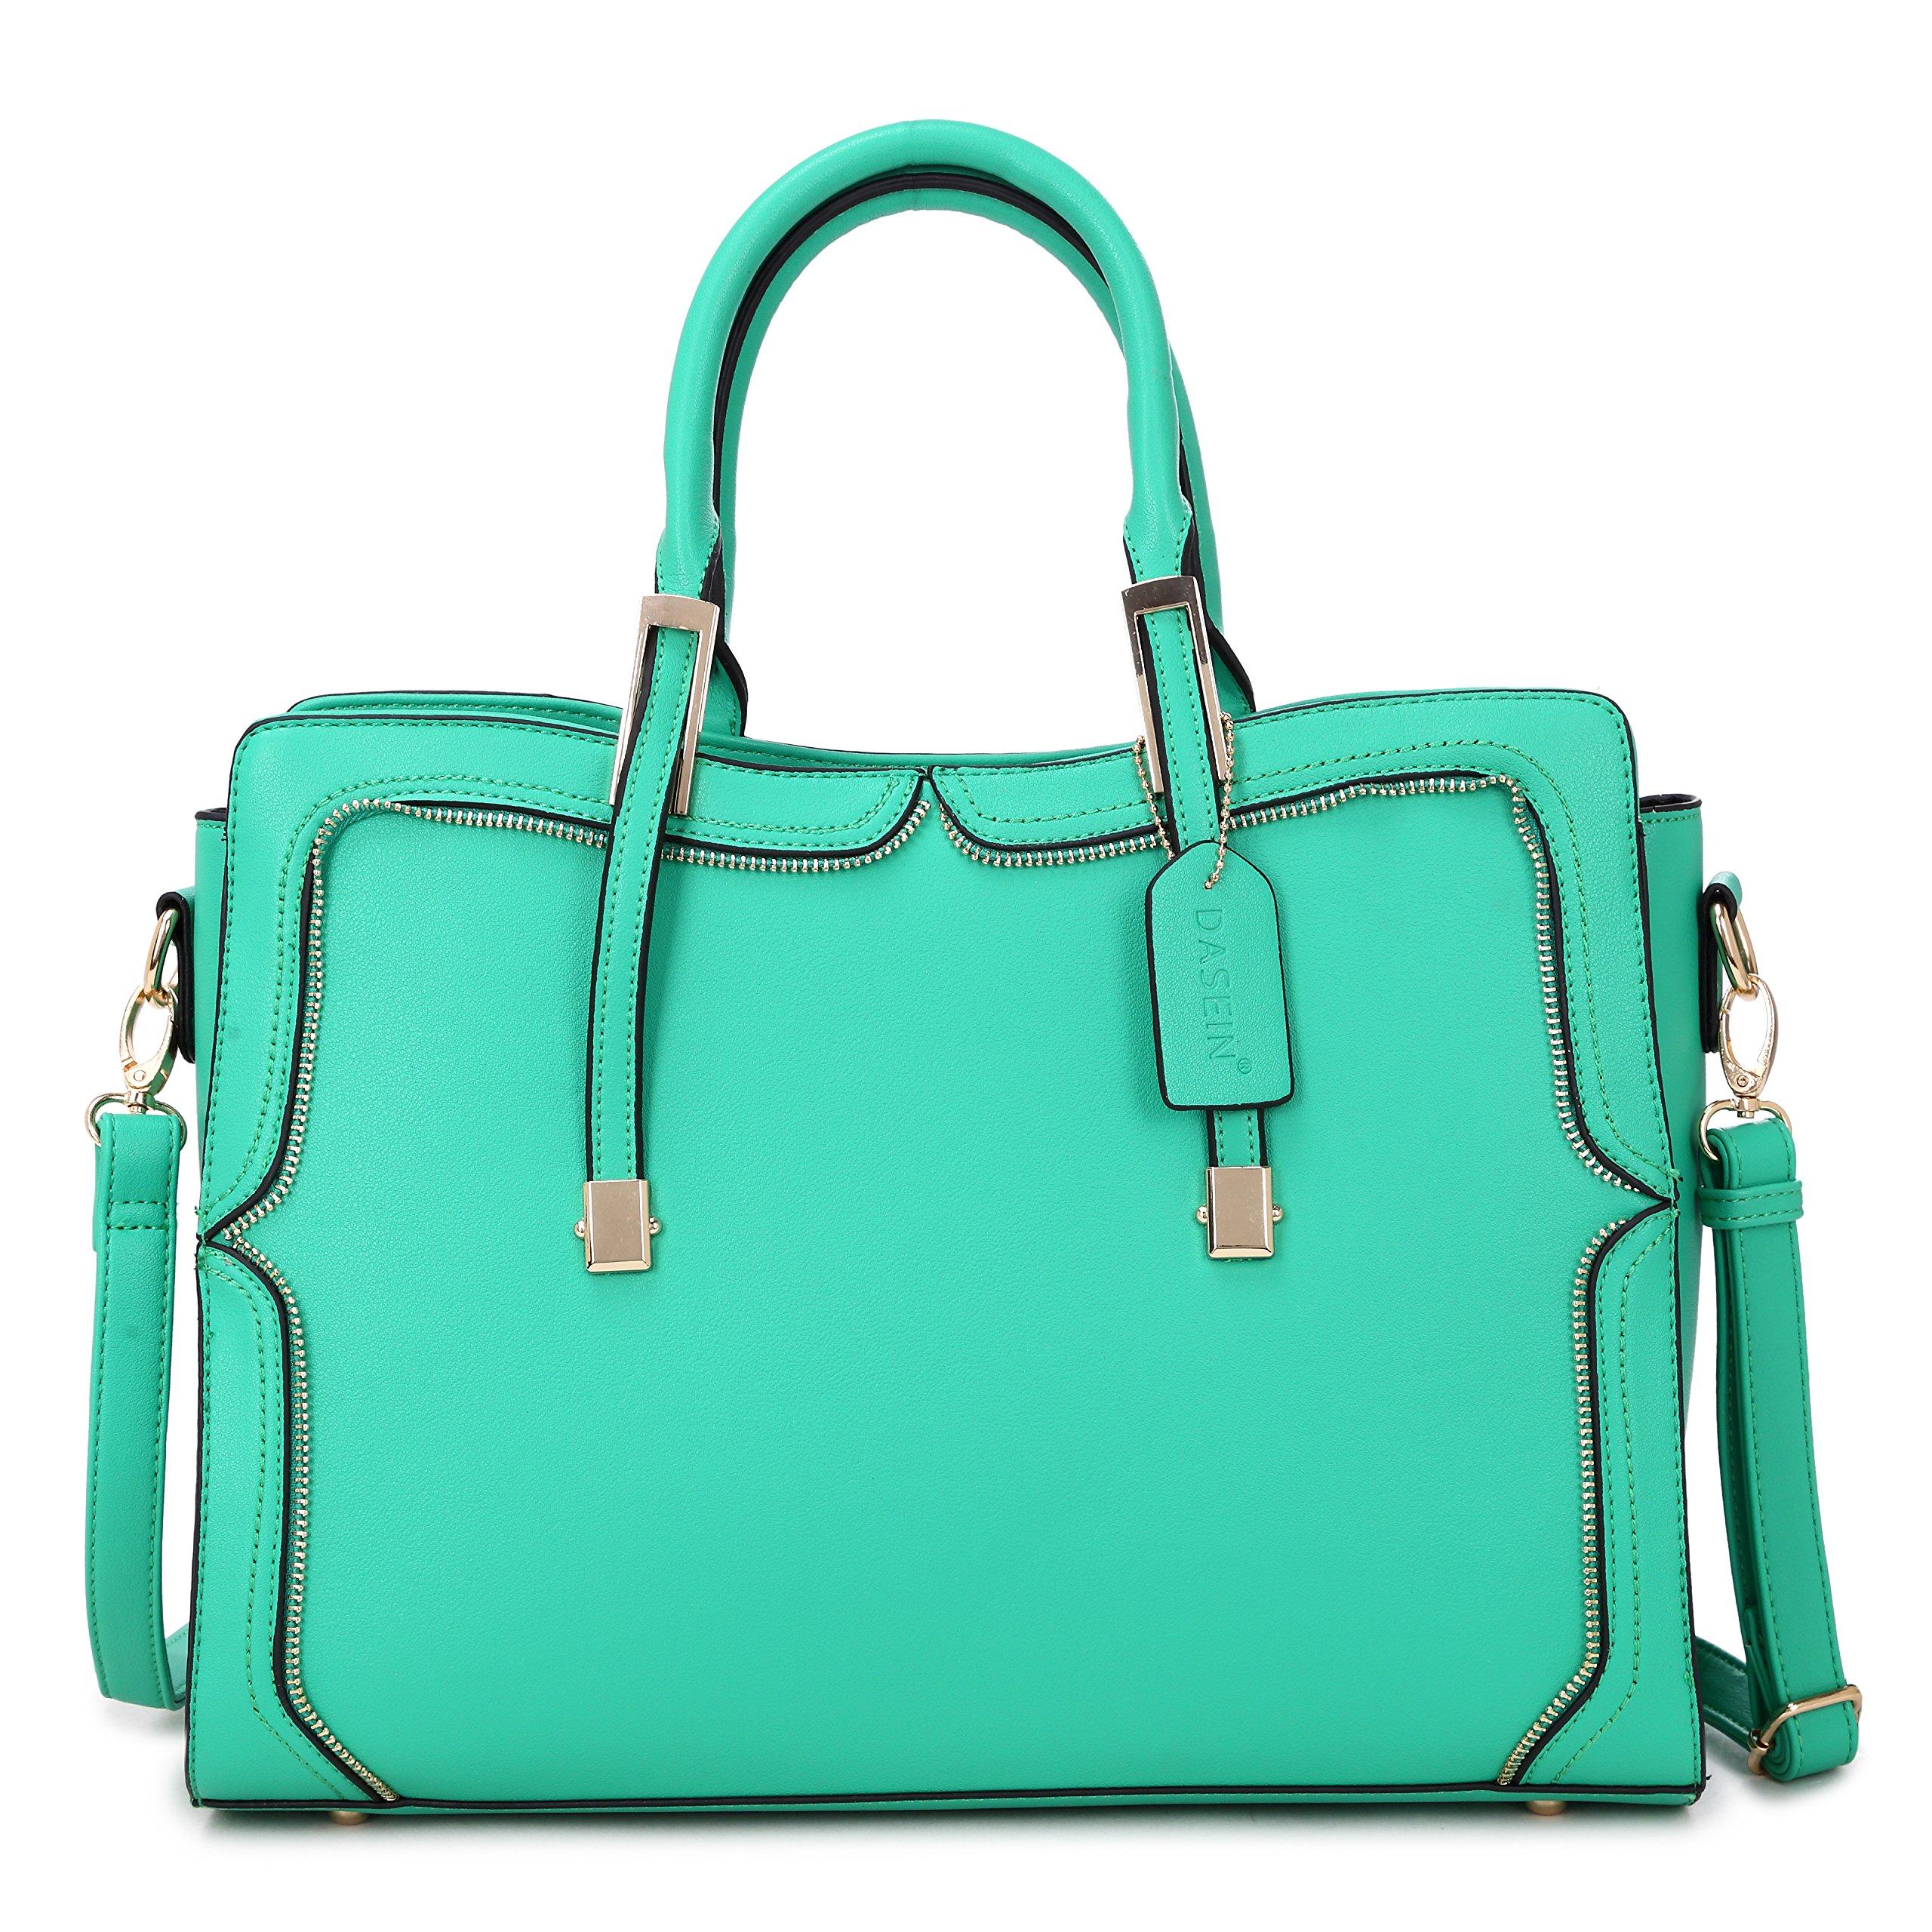 Top Handle Handbag Zip Purse Fashion Shoulder Bag Structured Crossbody Satchel Vegan Leather (8172-green)